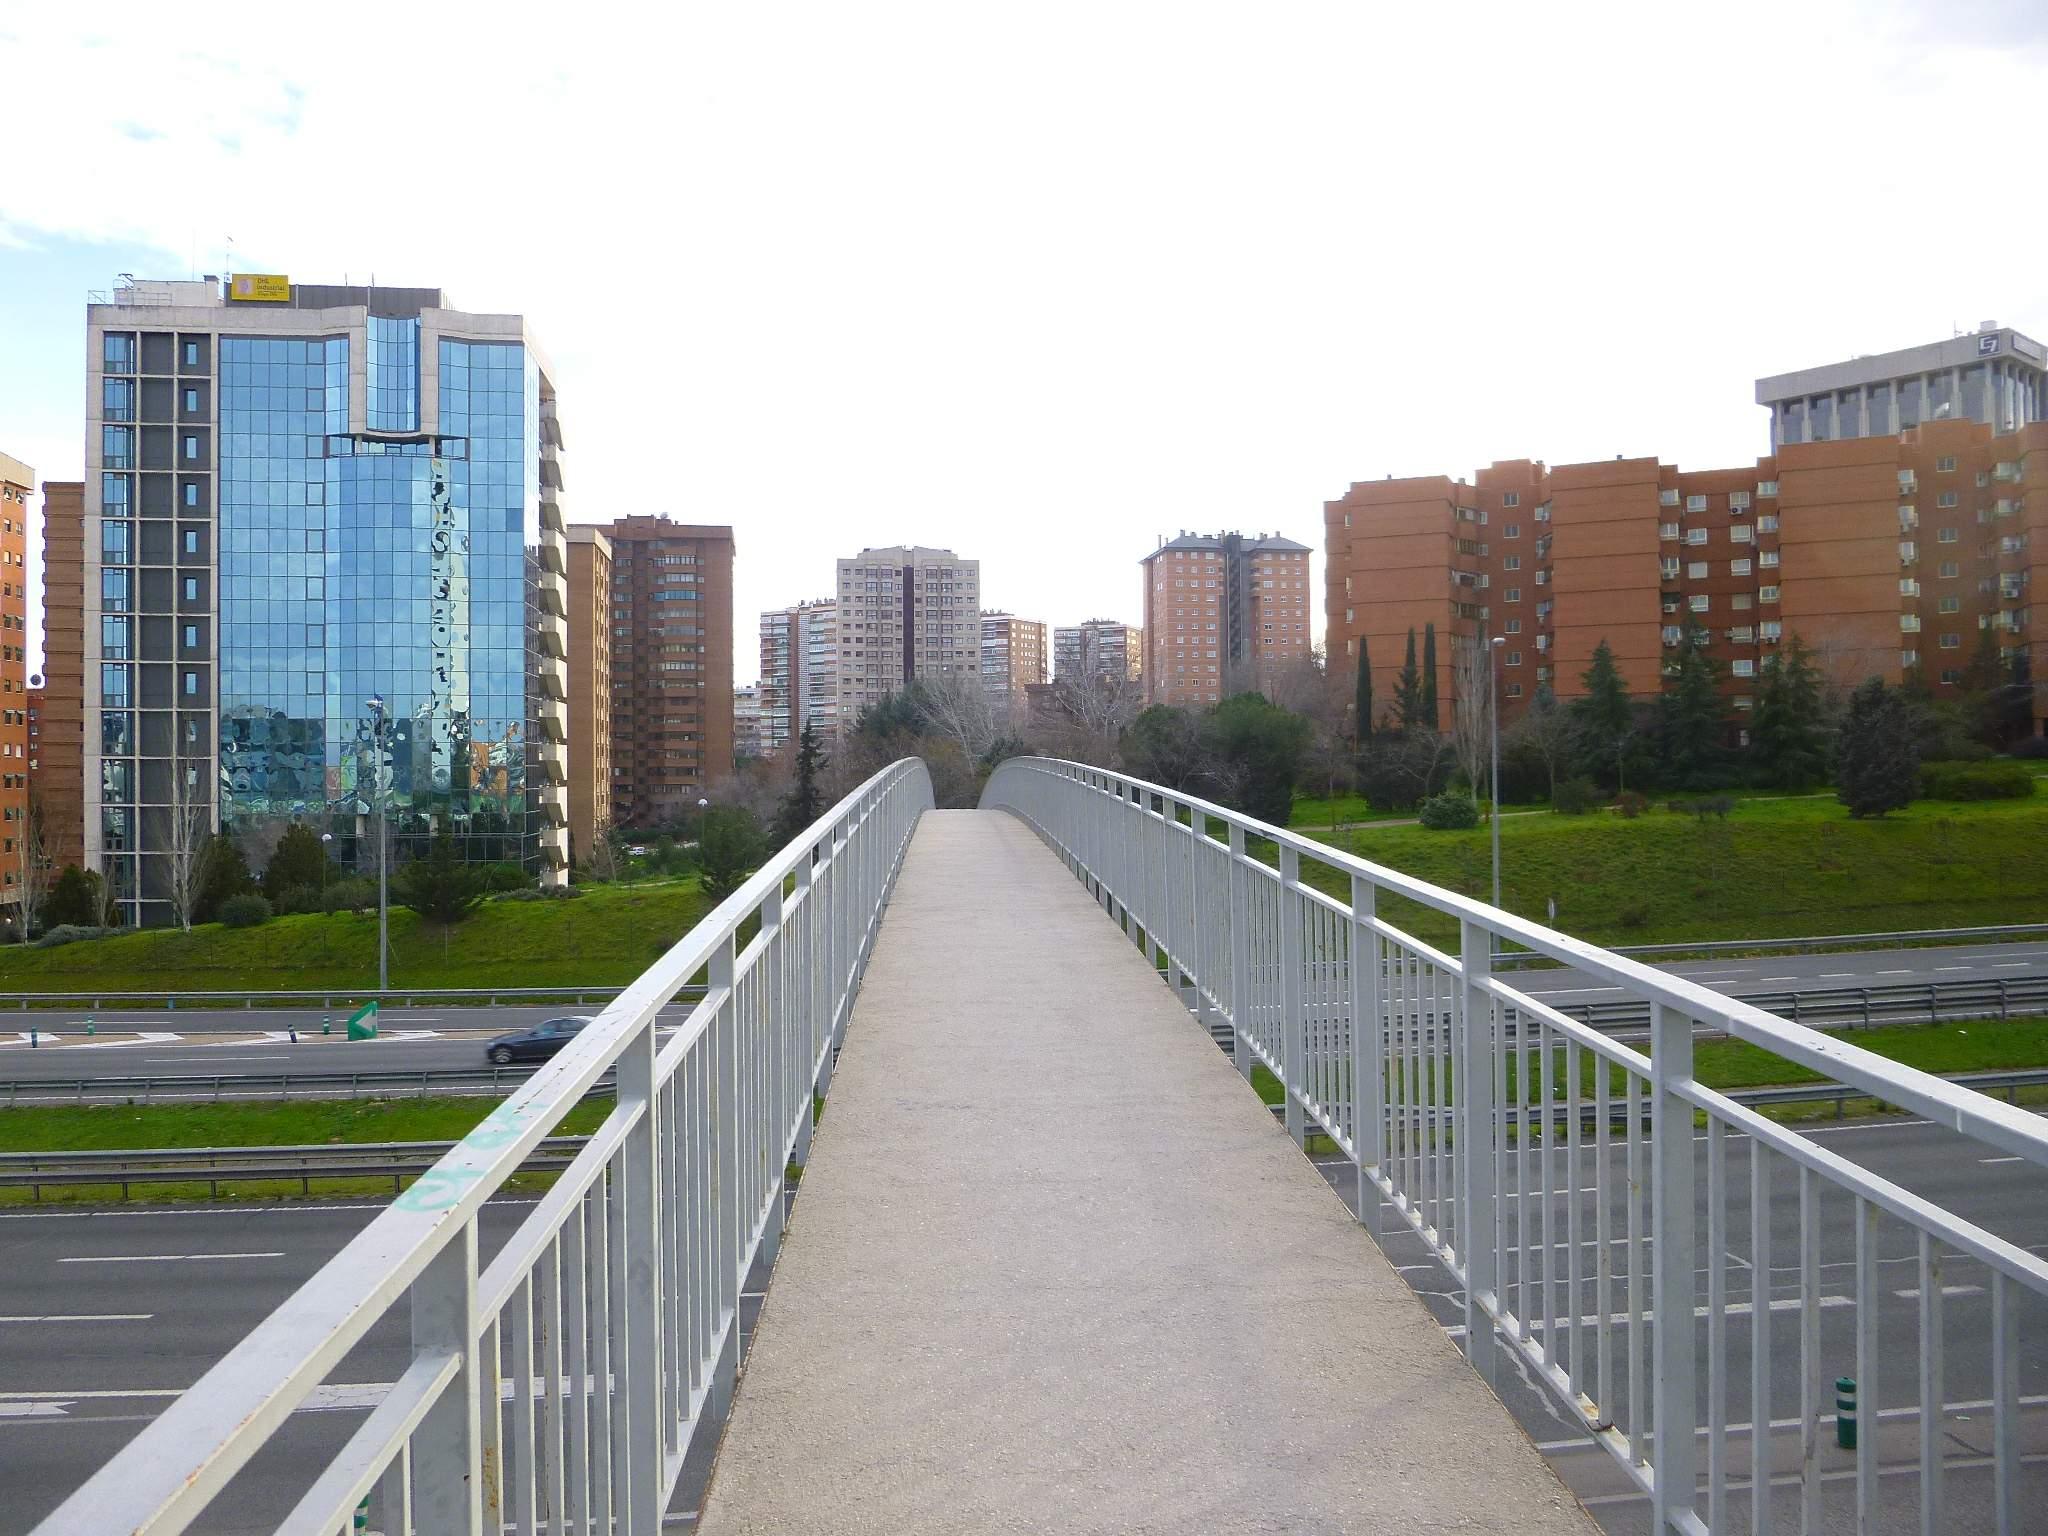 File:Madrid - Barrio de Pinar de Chamartín 1.JPG - Wikimedia Commons